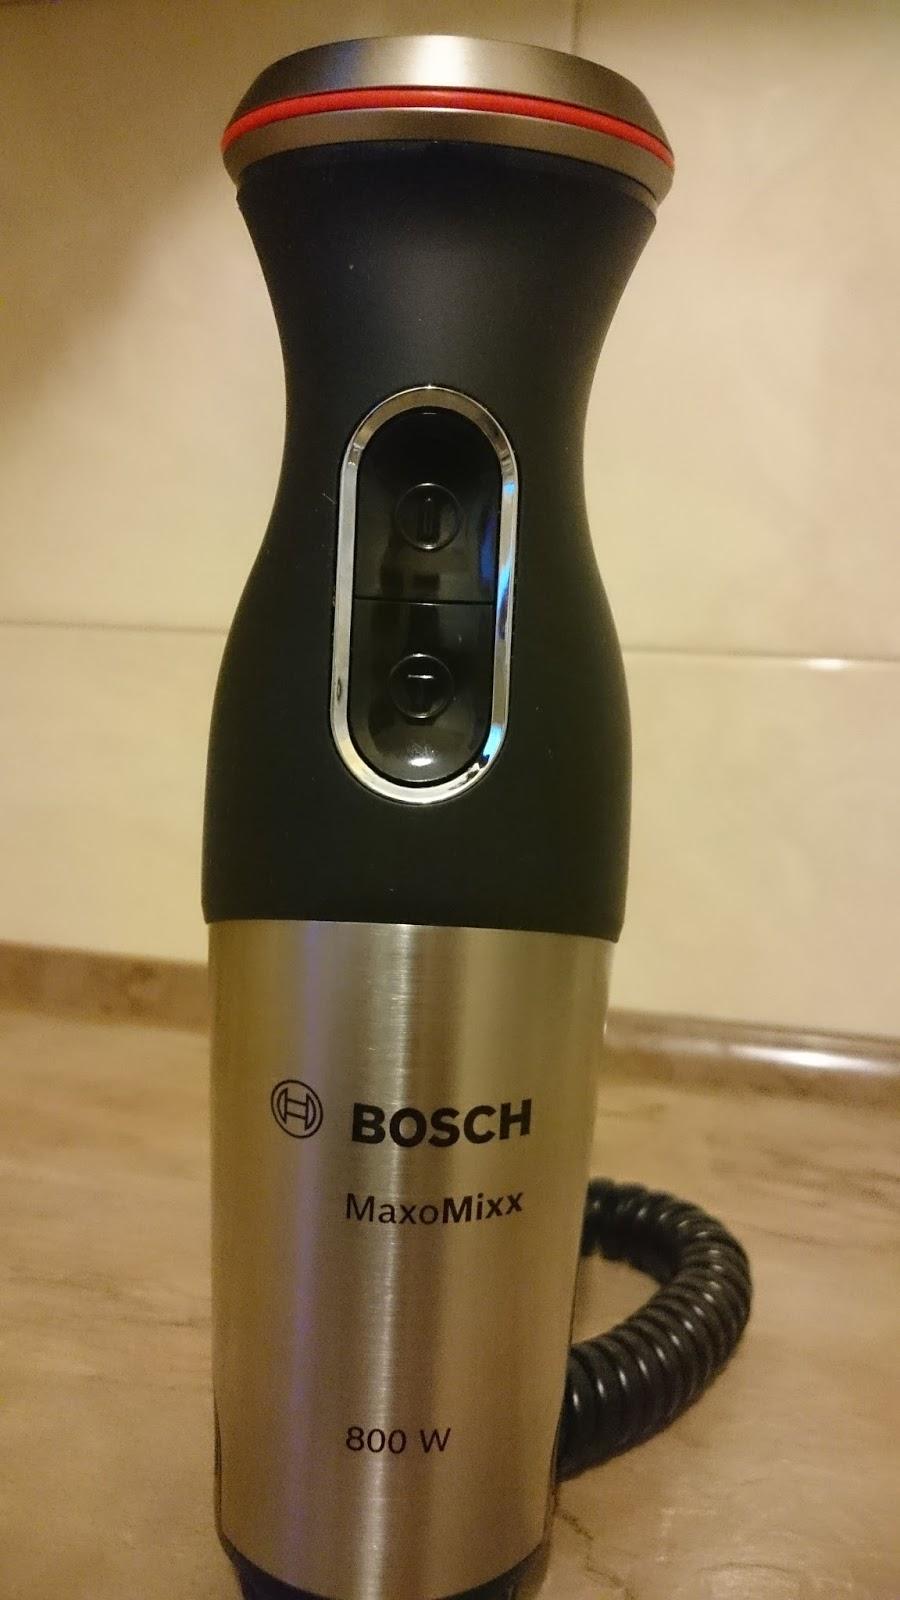 blender Bosch MaxoMixx MSM88190